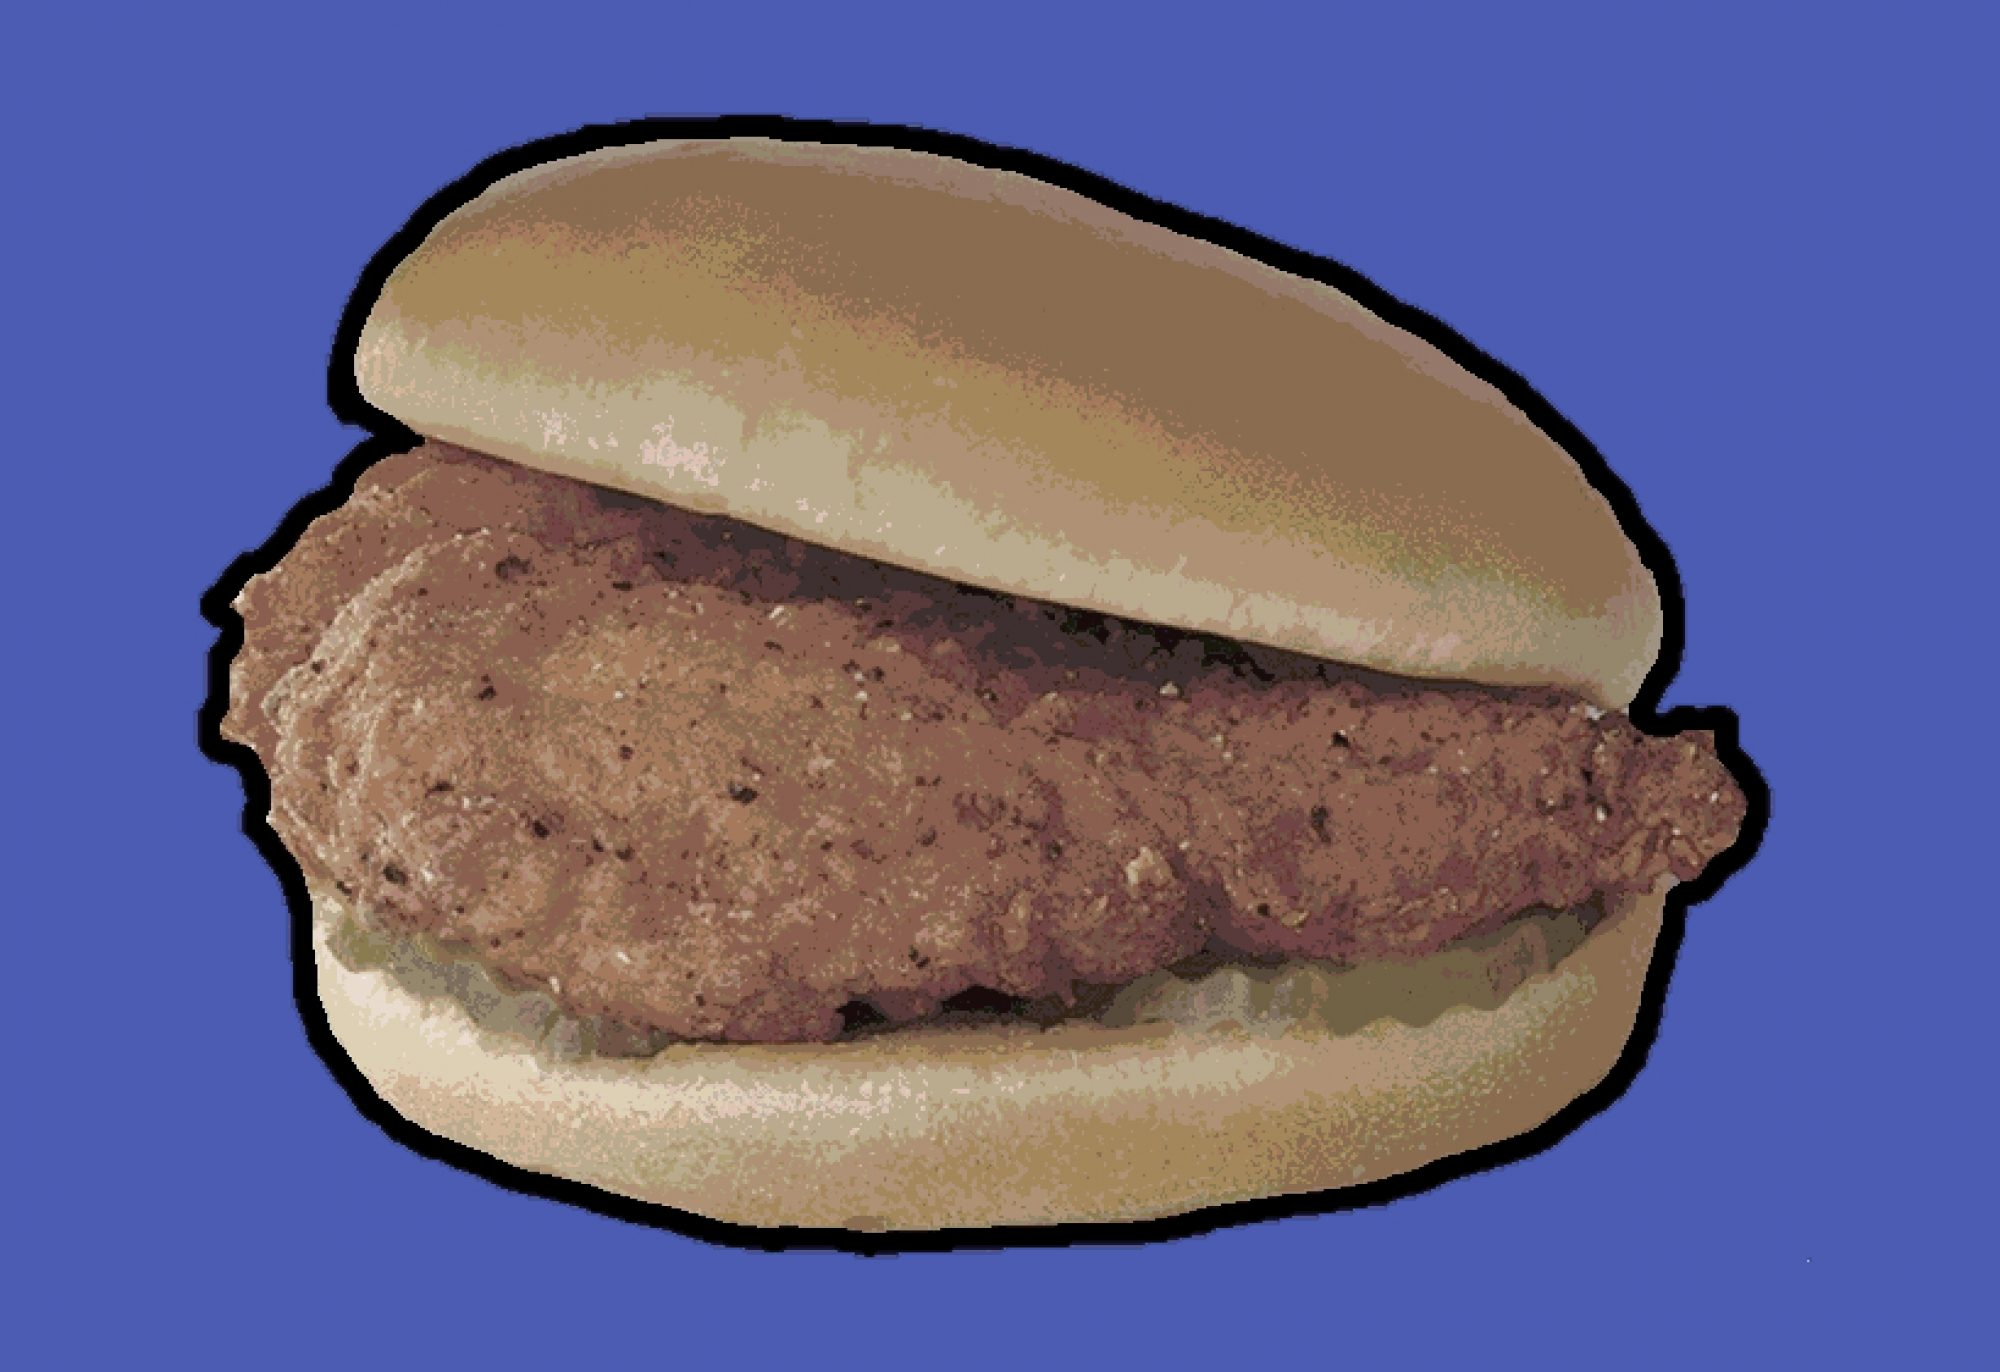 MeatGoblet.com